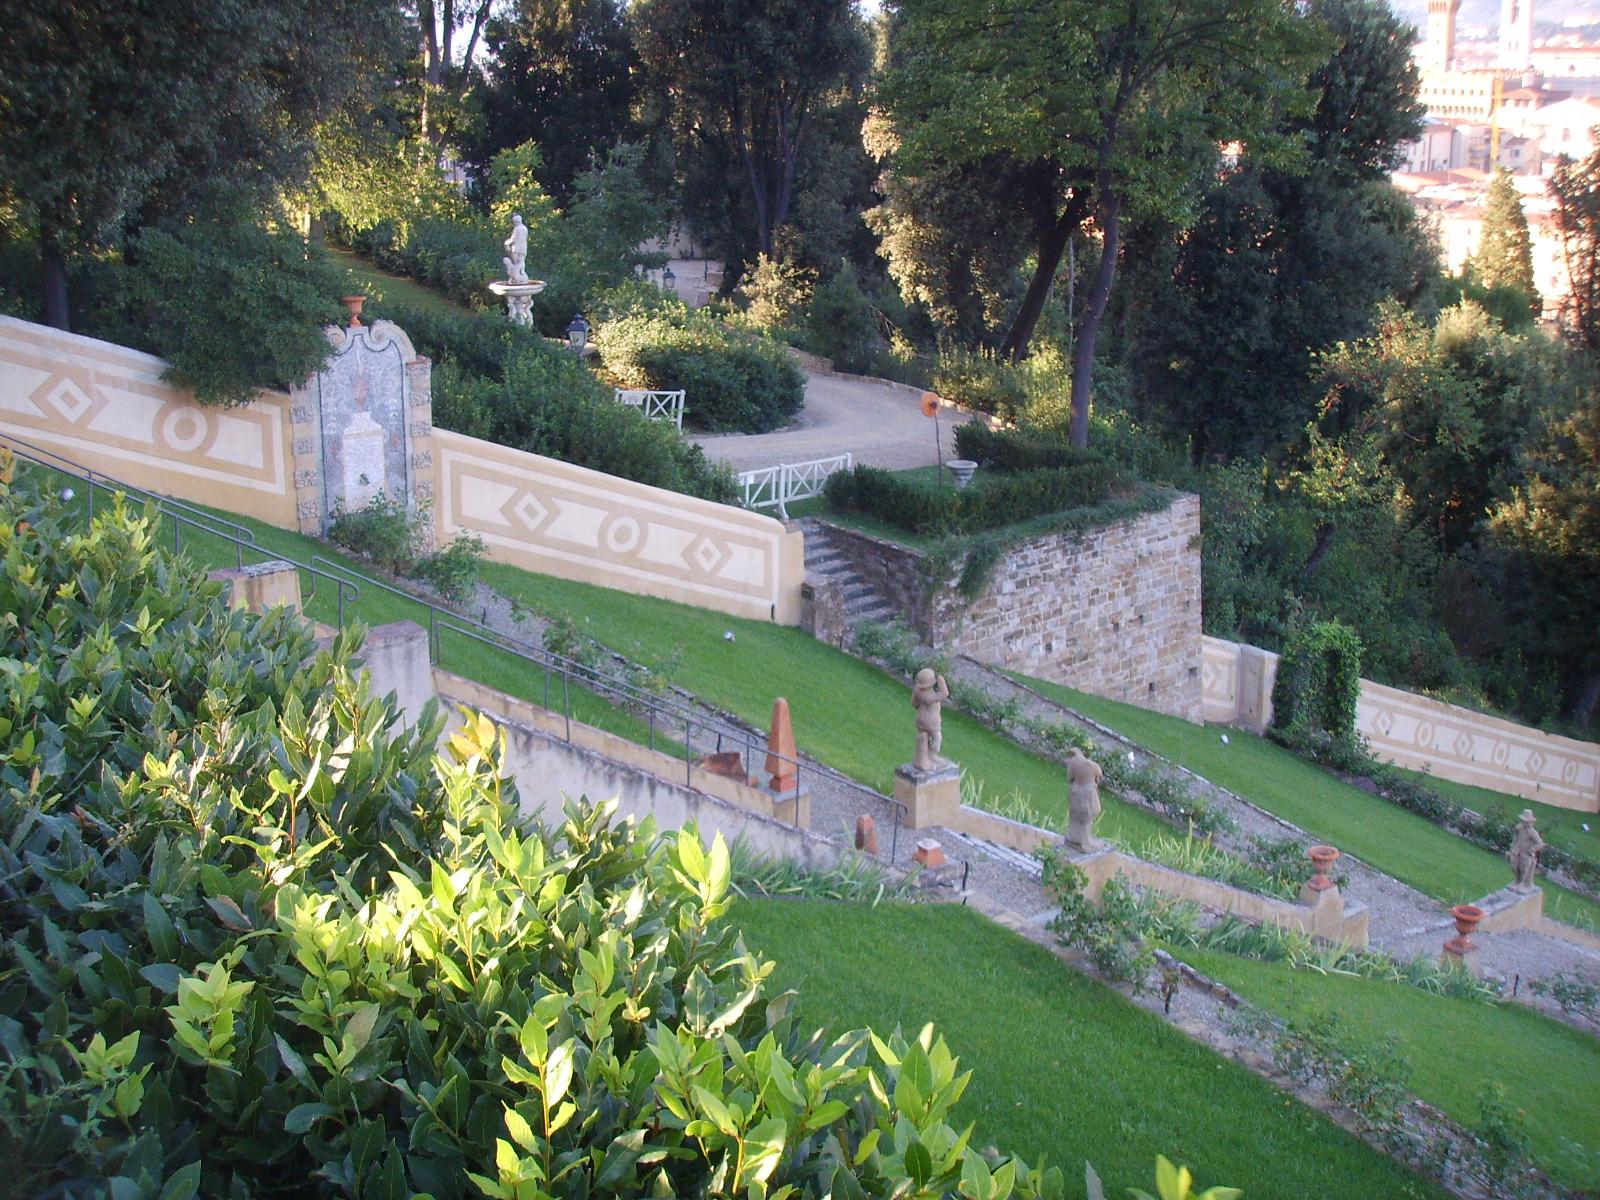 File:Giardino bardini, terrazzamento 01.JPG - Wikipedia